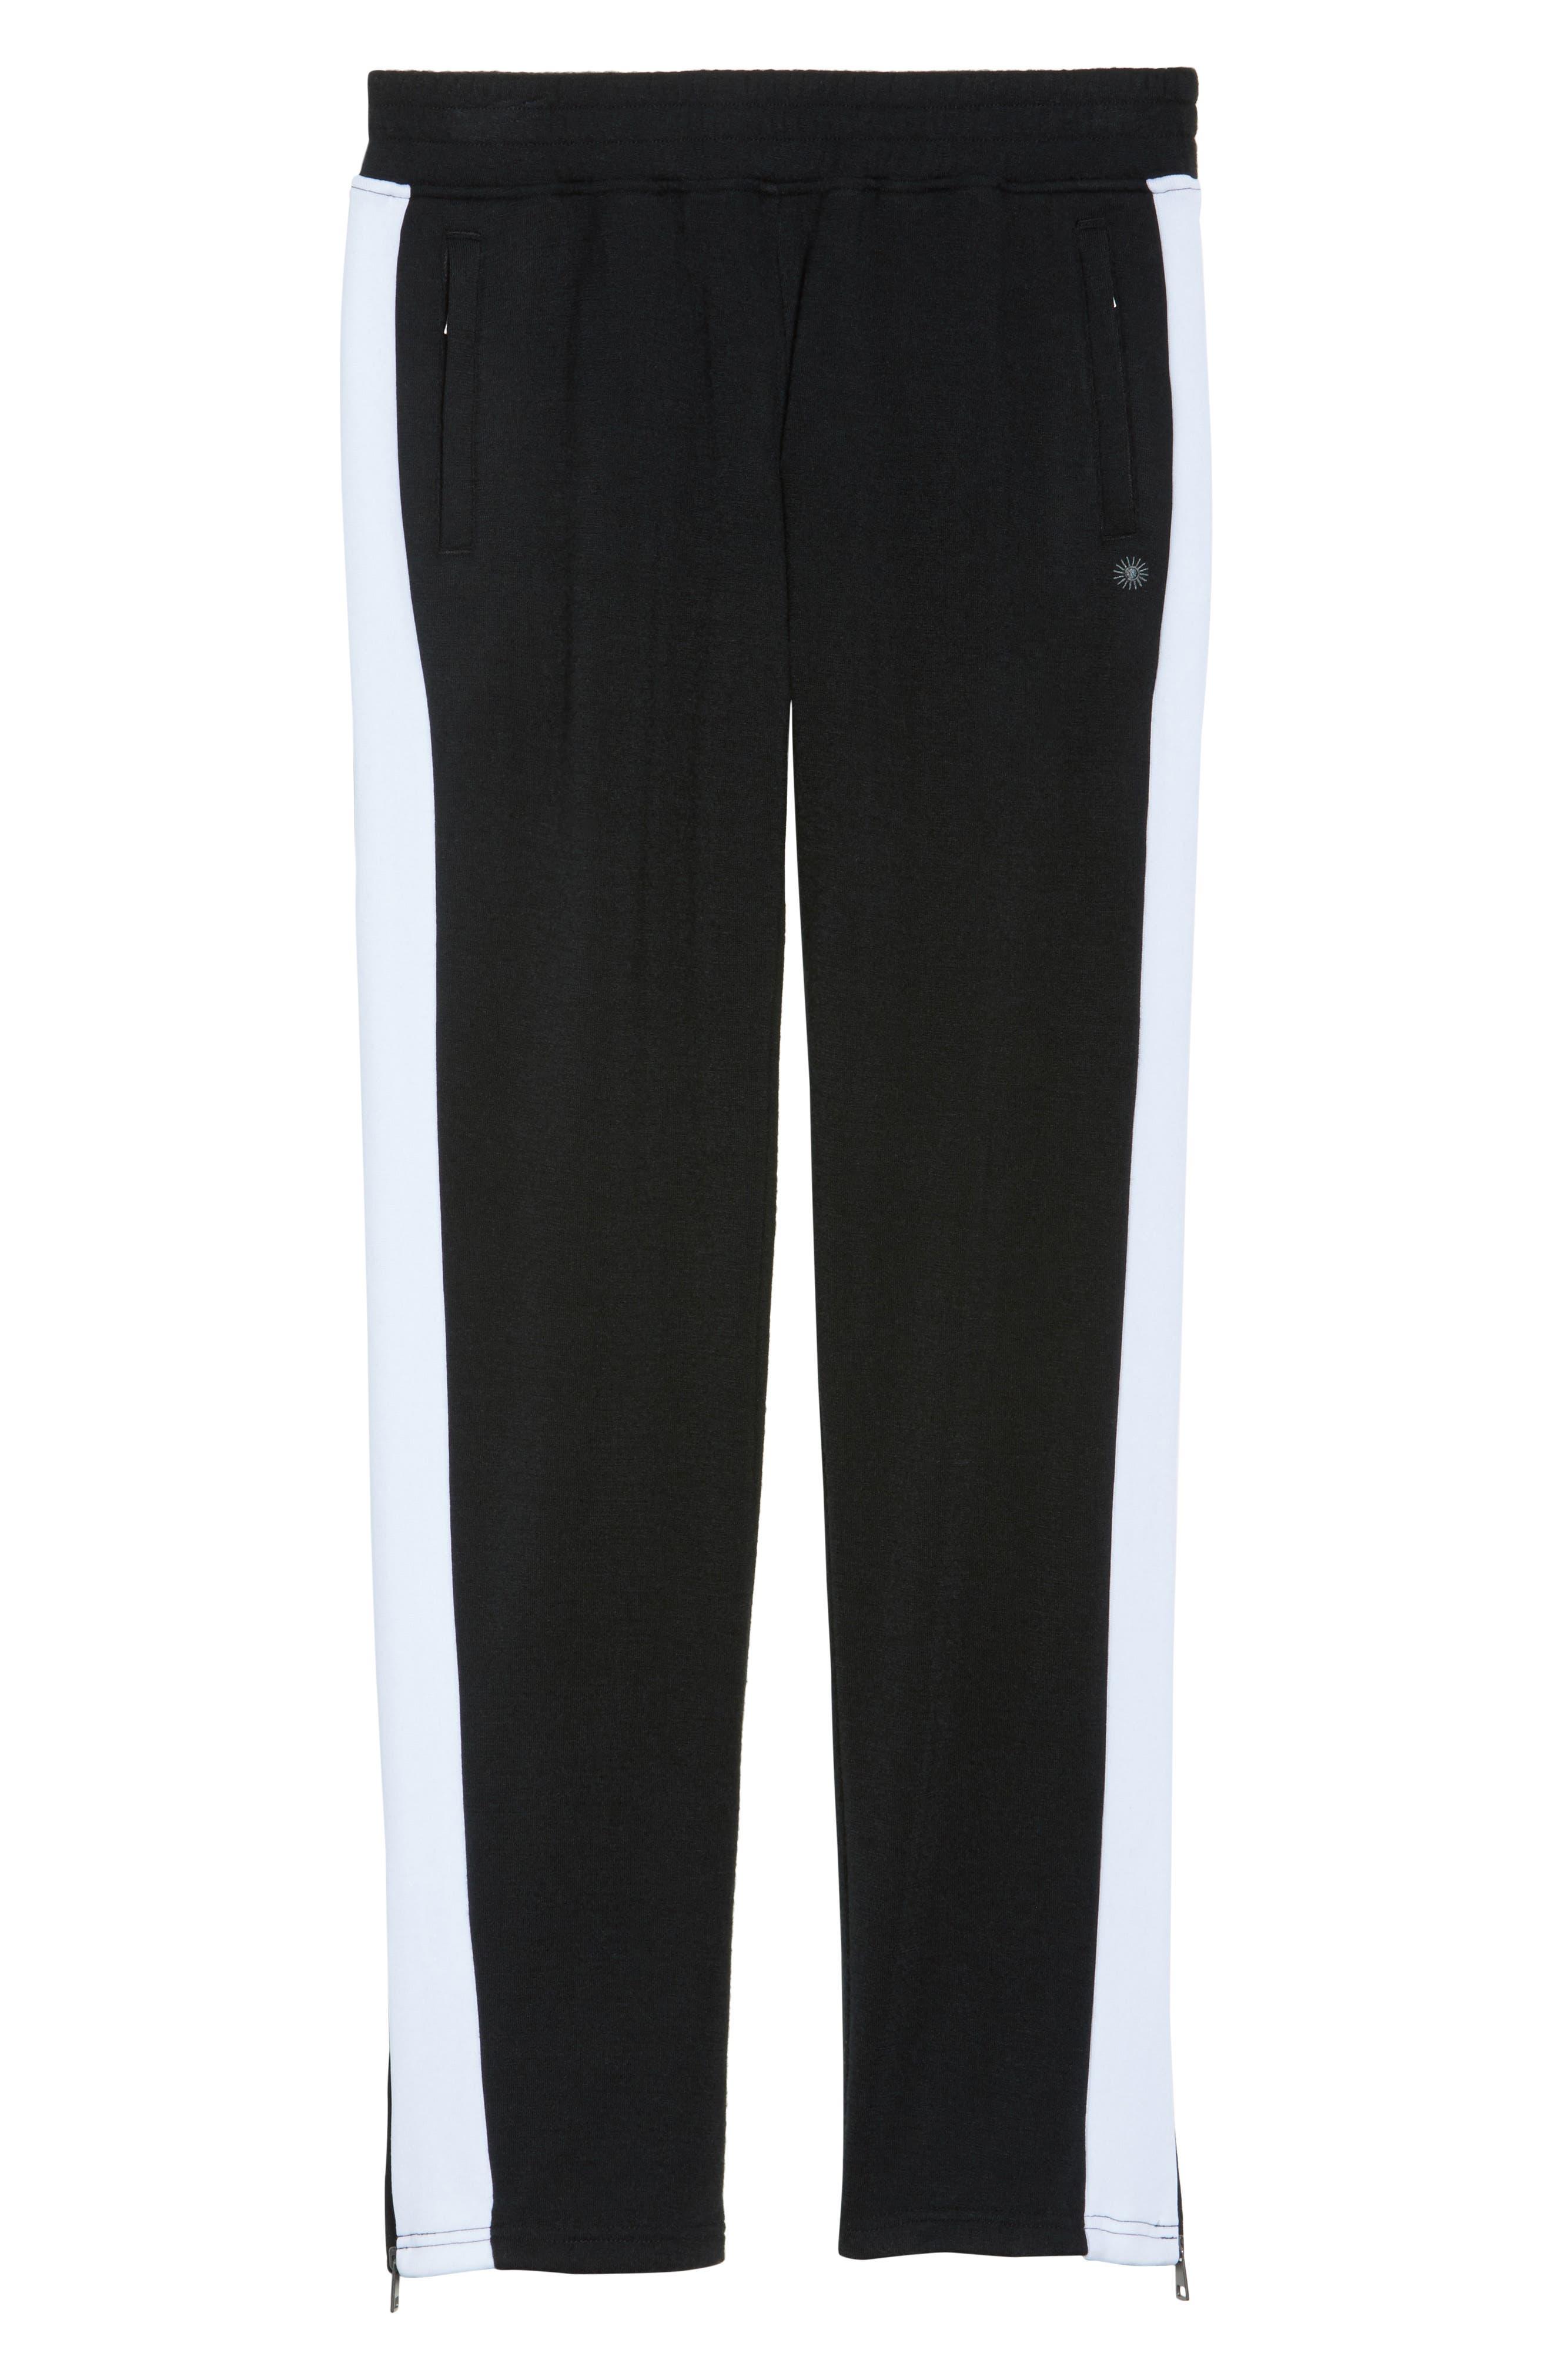 Lizy Track Pants,                             Alternate thumbnail 4, color,                             Black